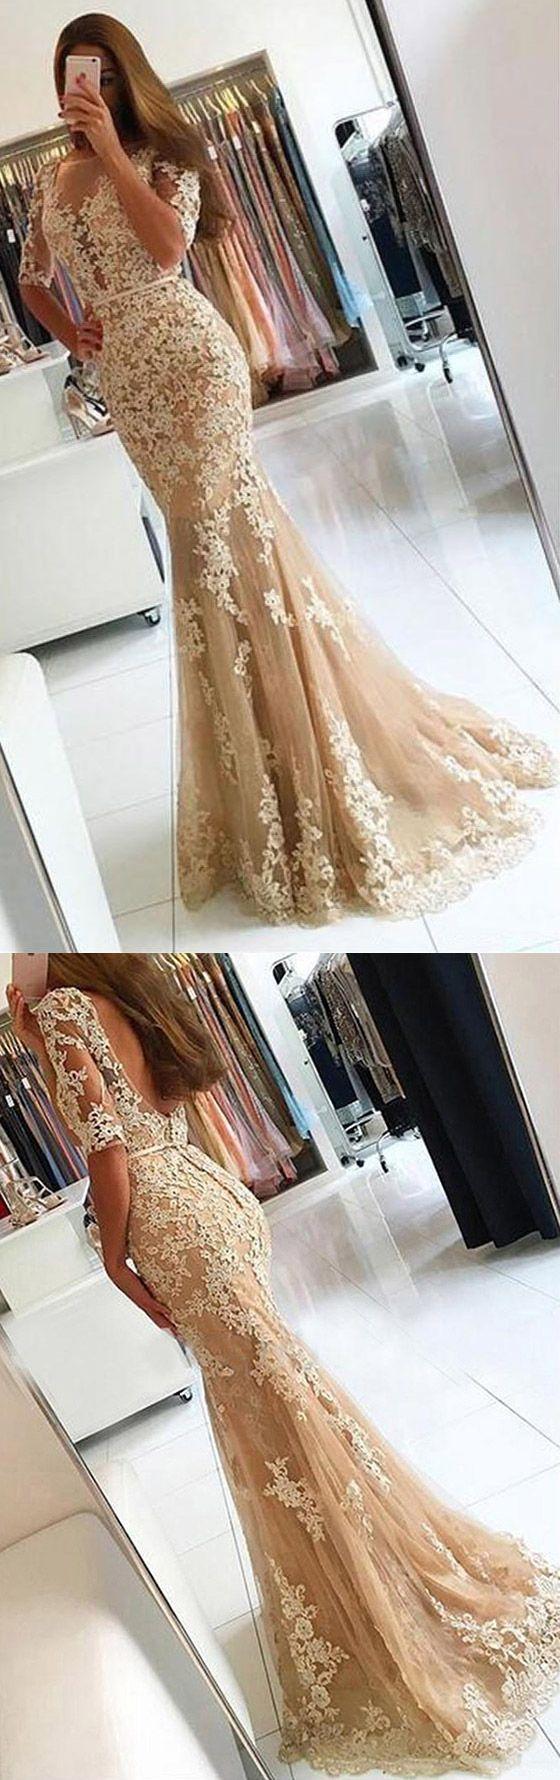 Mermaid prom dresses lace party dresses backless elegant